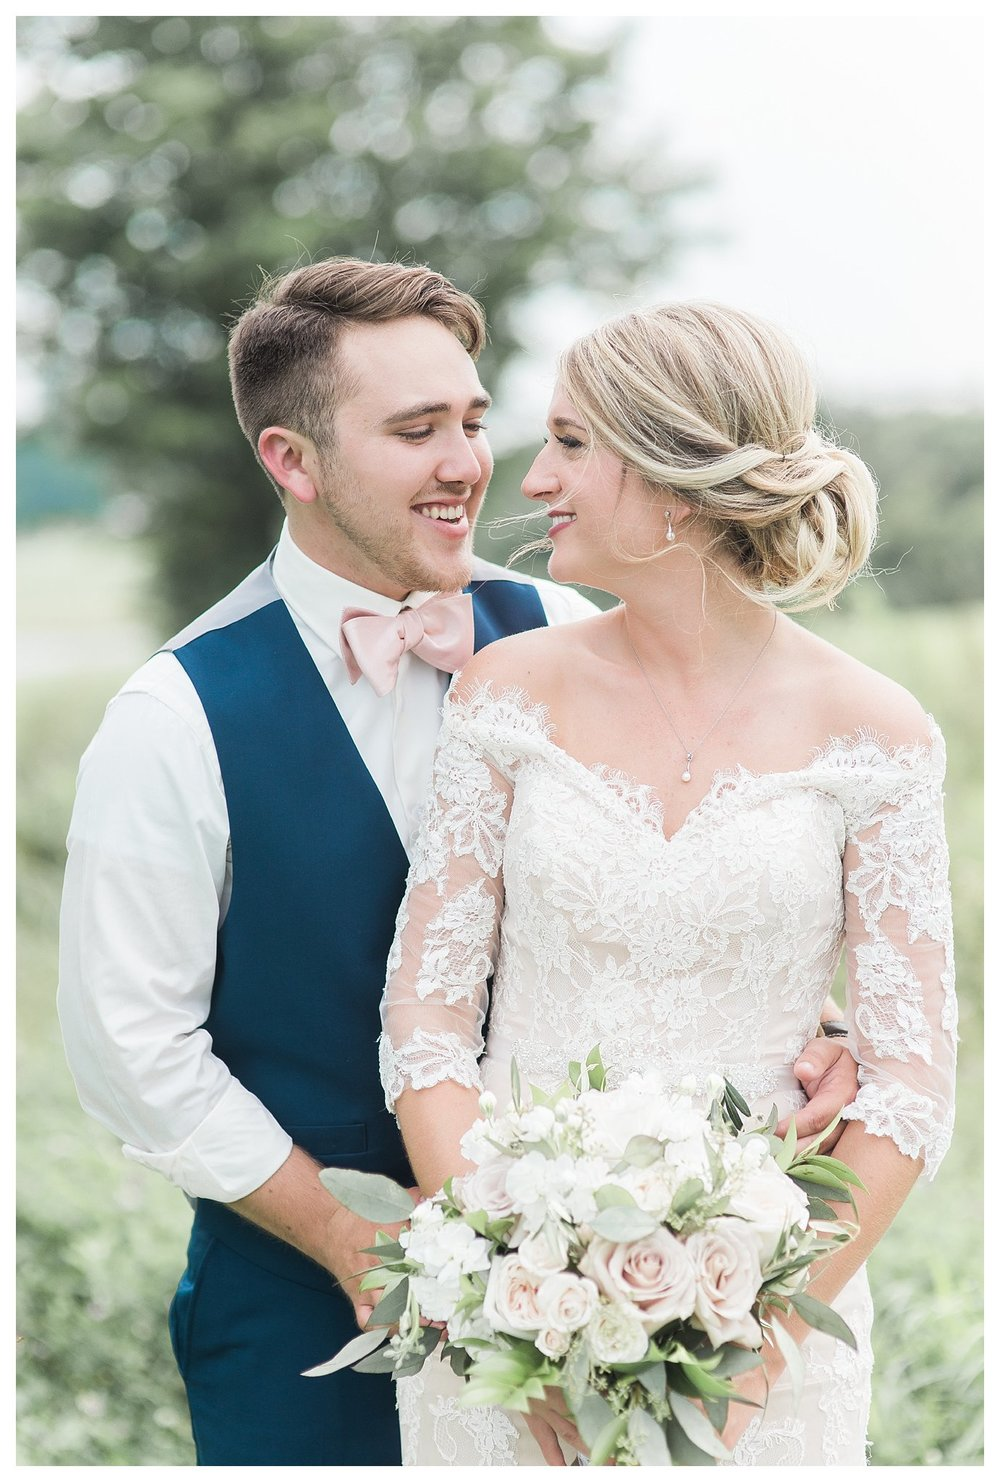 tower-park-mess-hall-everleigh-photography-northern-kentucky-wedding-photographer-20